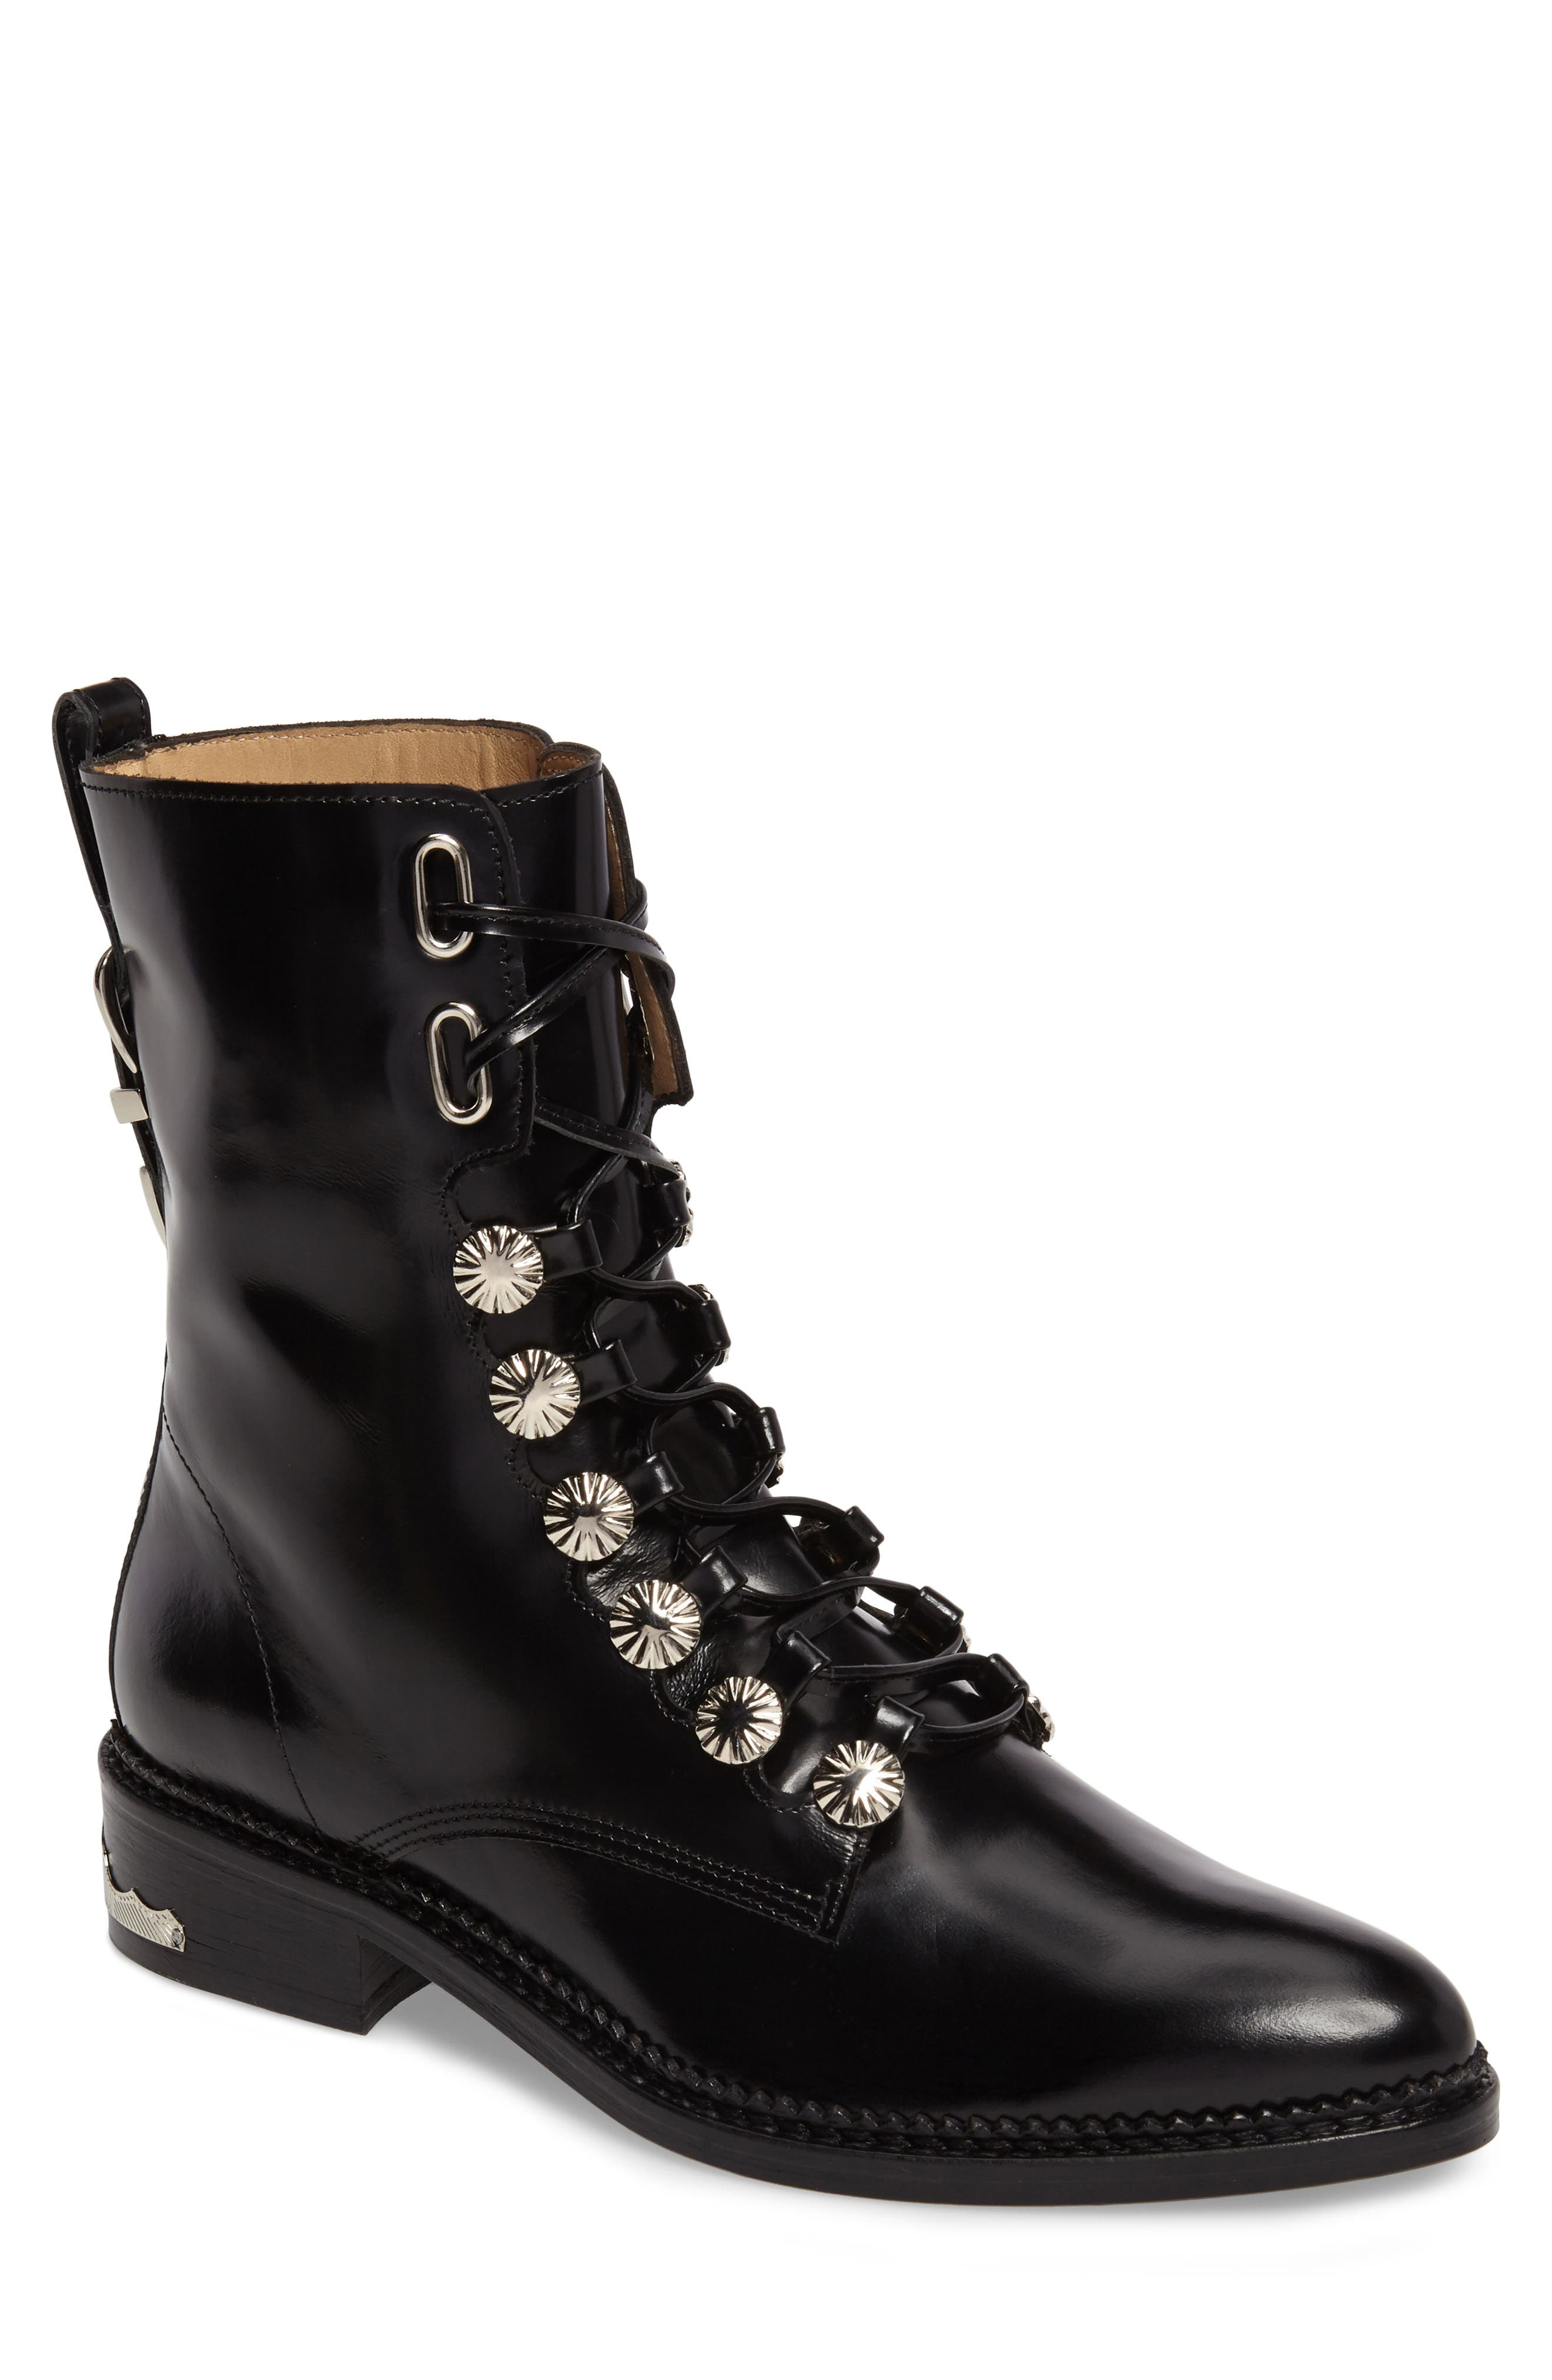 Alternate Image 1 Selected - TOGA PULLA Embellished Lace-Up Boot (Women)